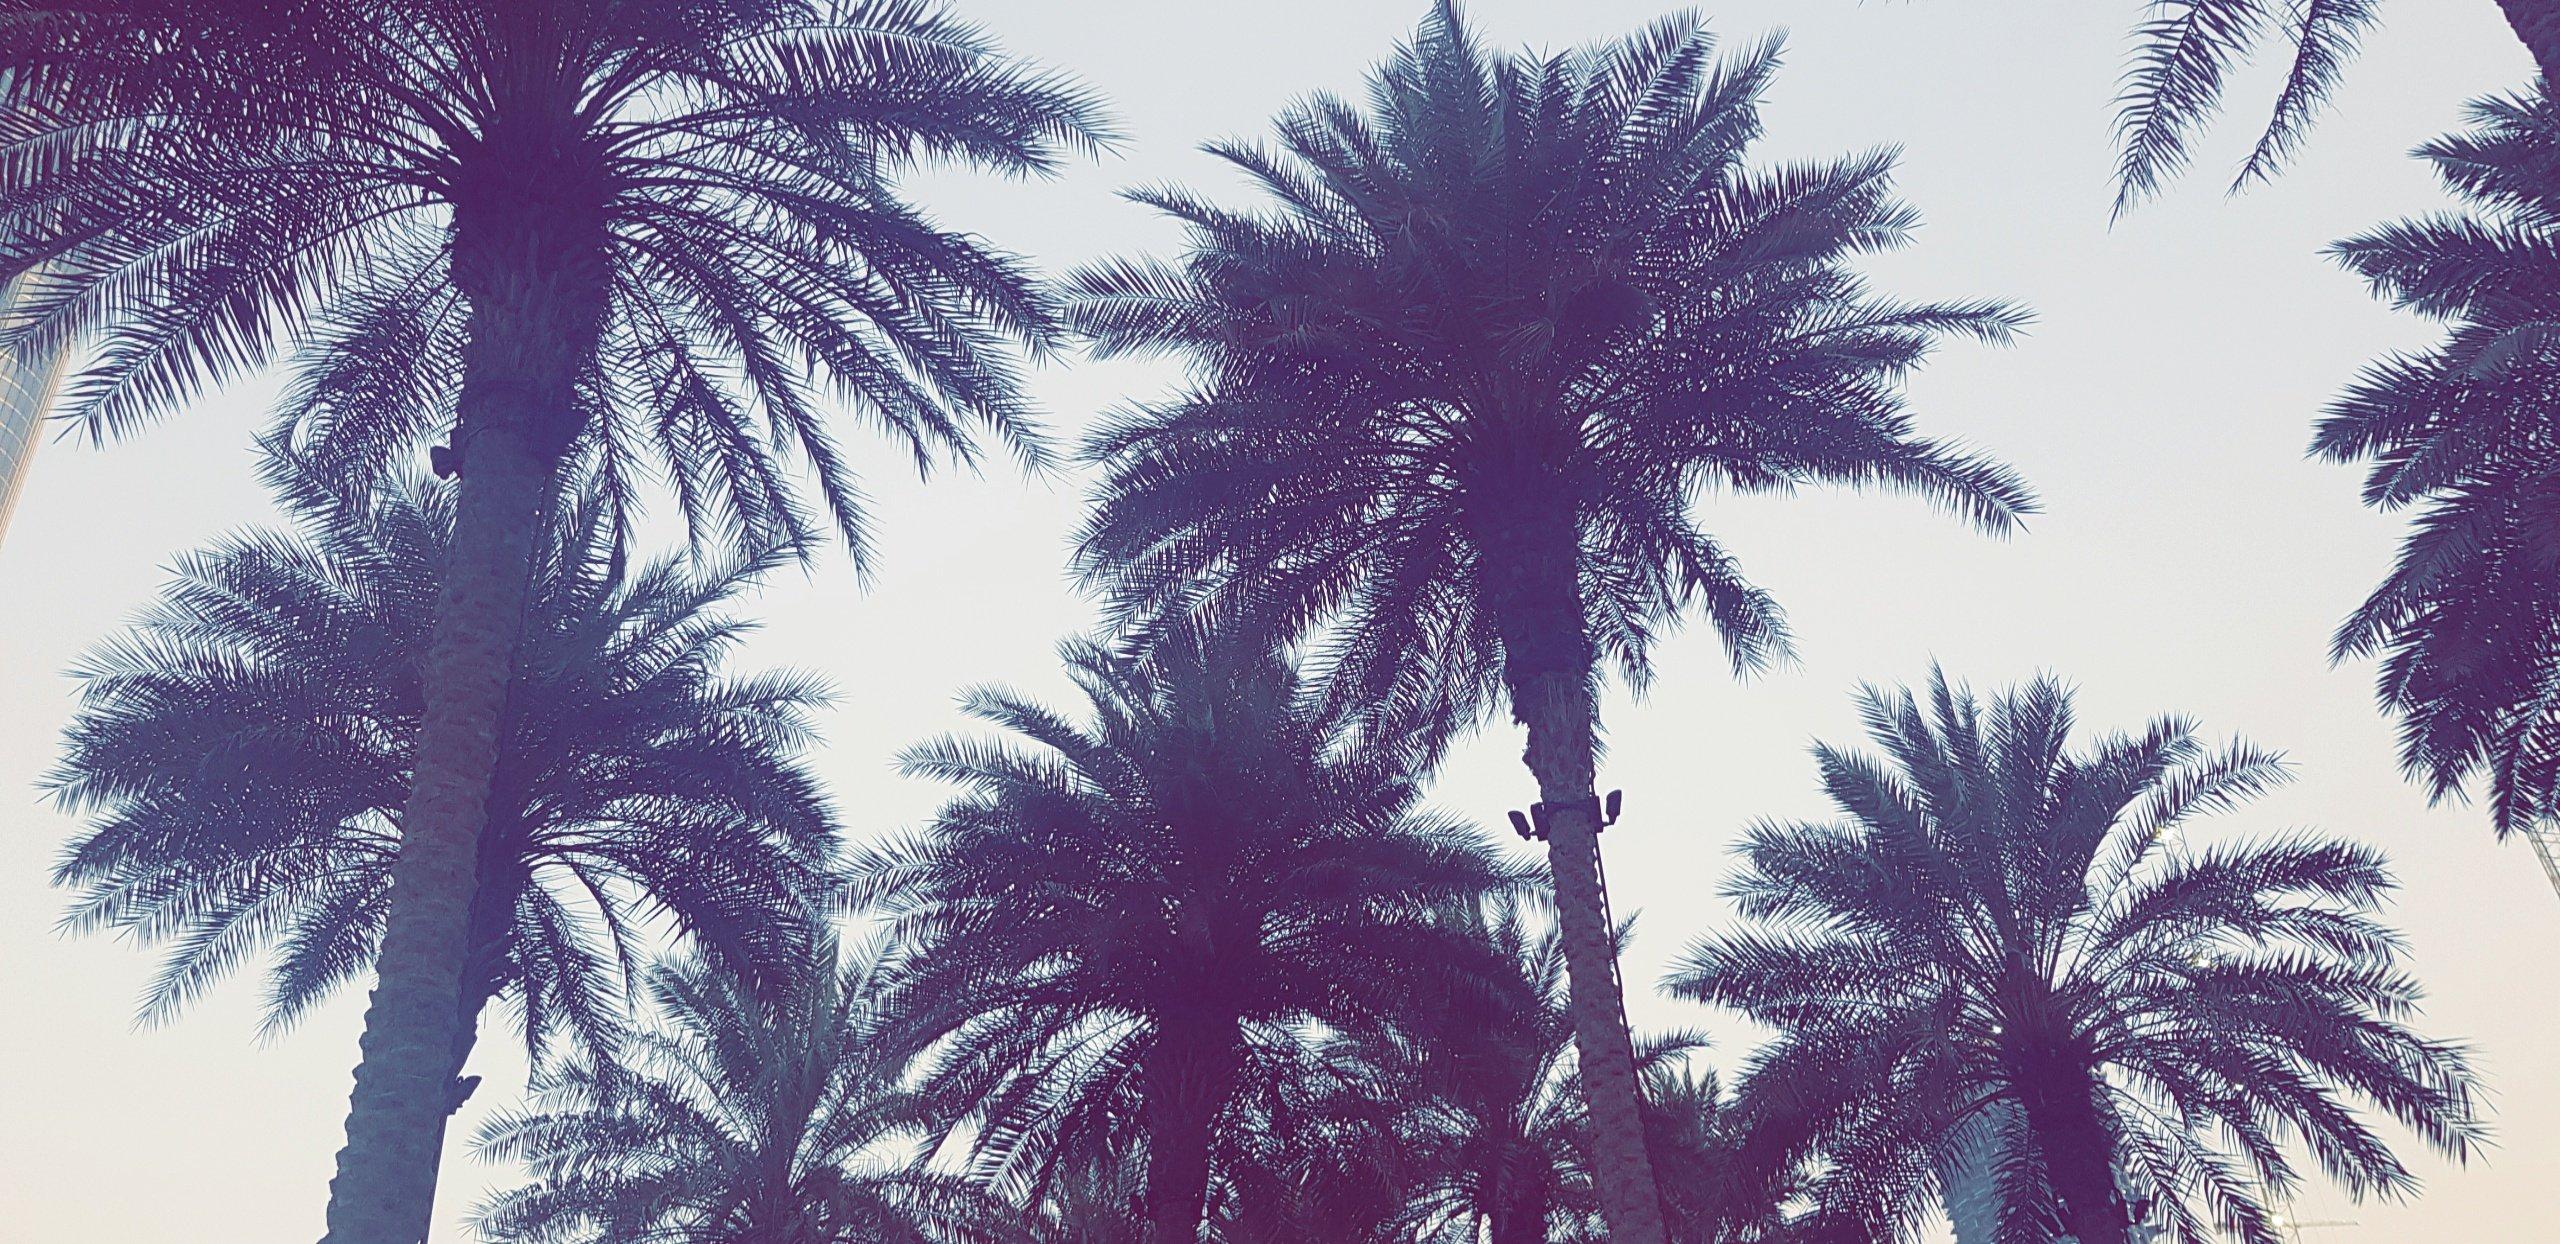 Palm Tree Wallpaper 4k - HD Wallpaper